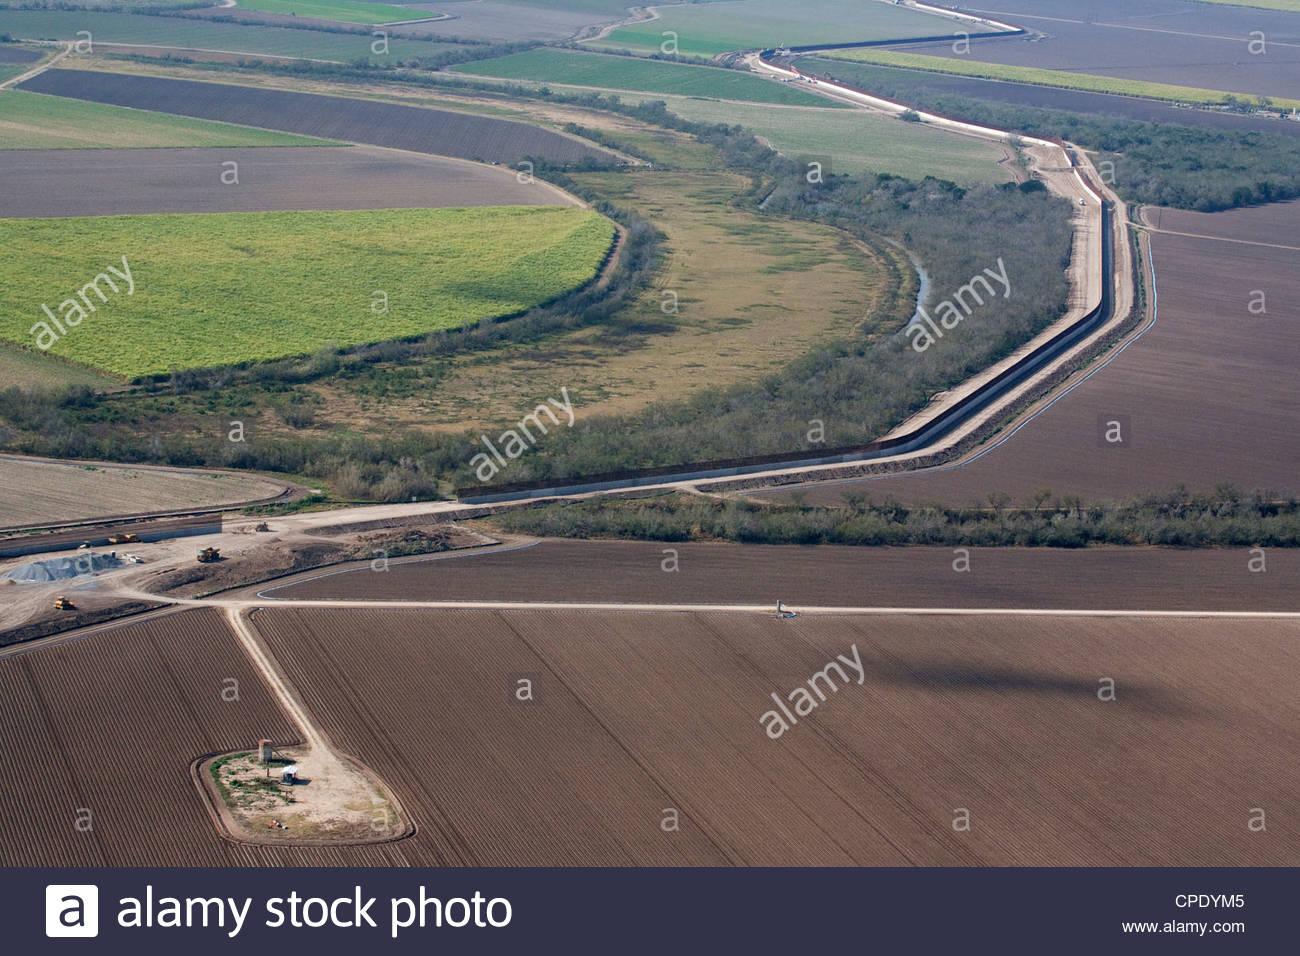 Aerial of border wall fence hidalgo county lower rio grande valley texas near mexico rio grande